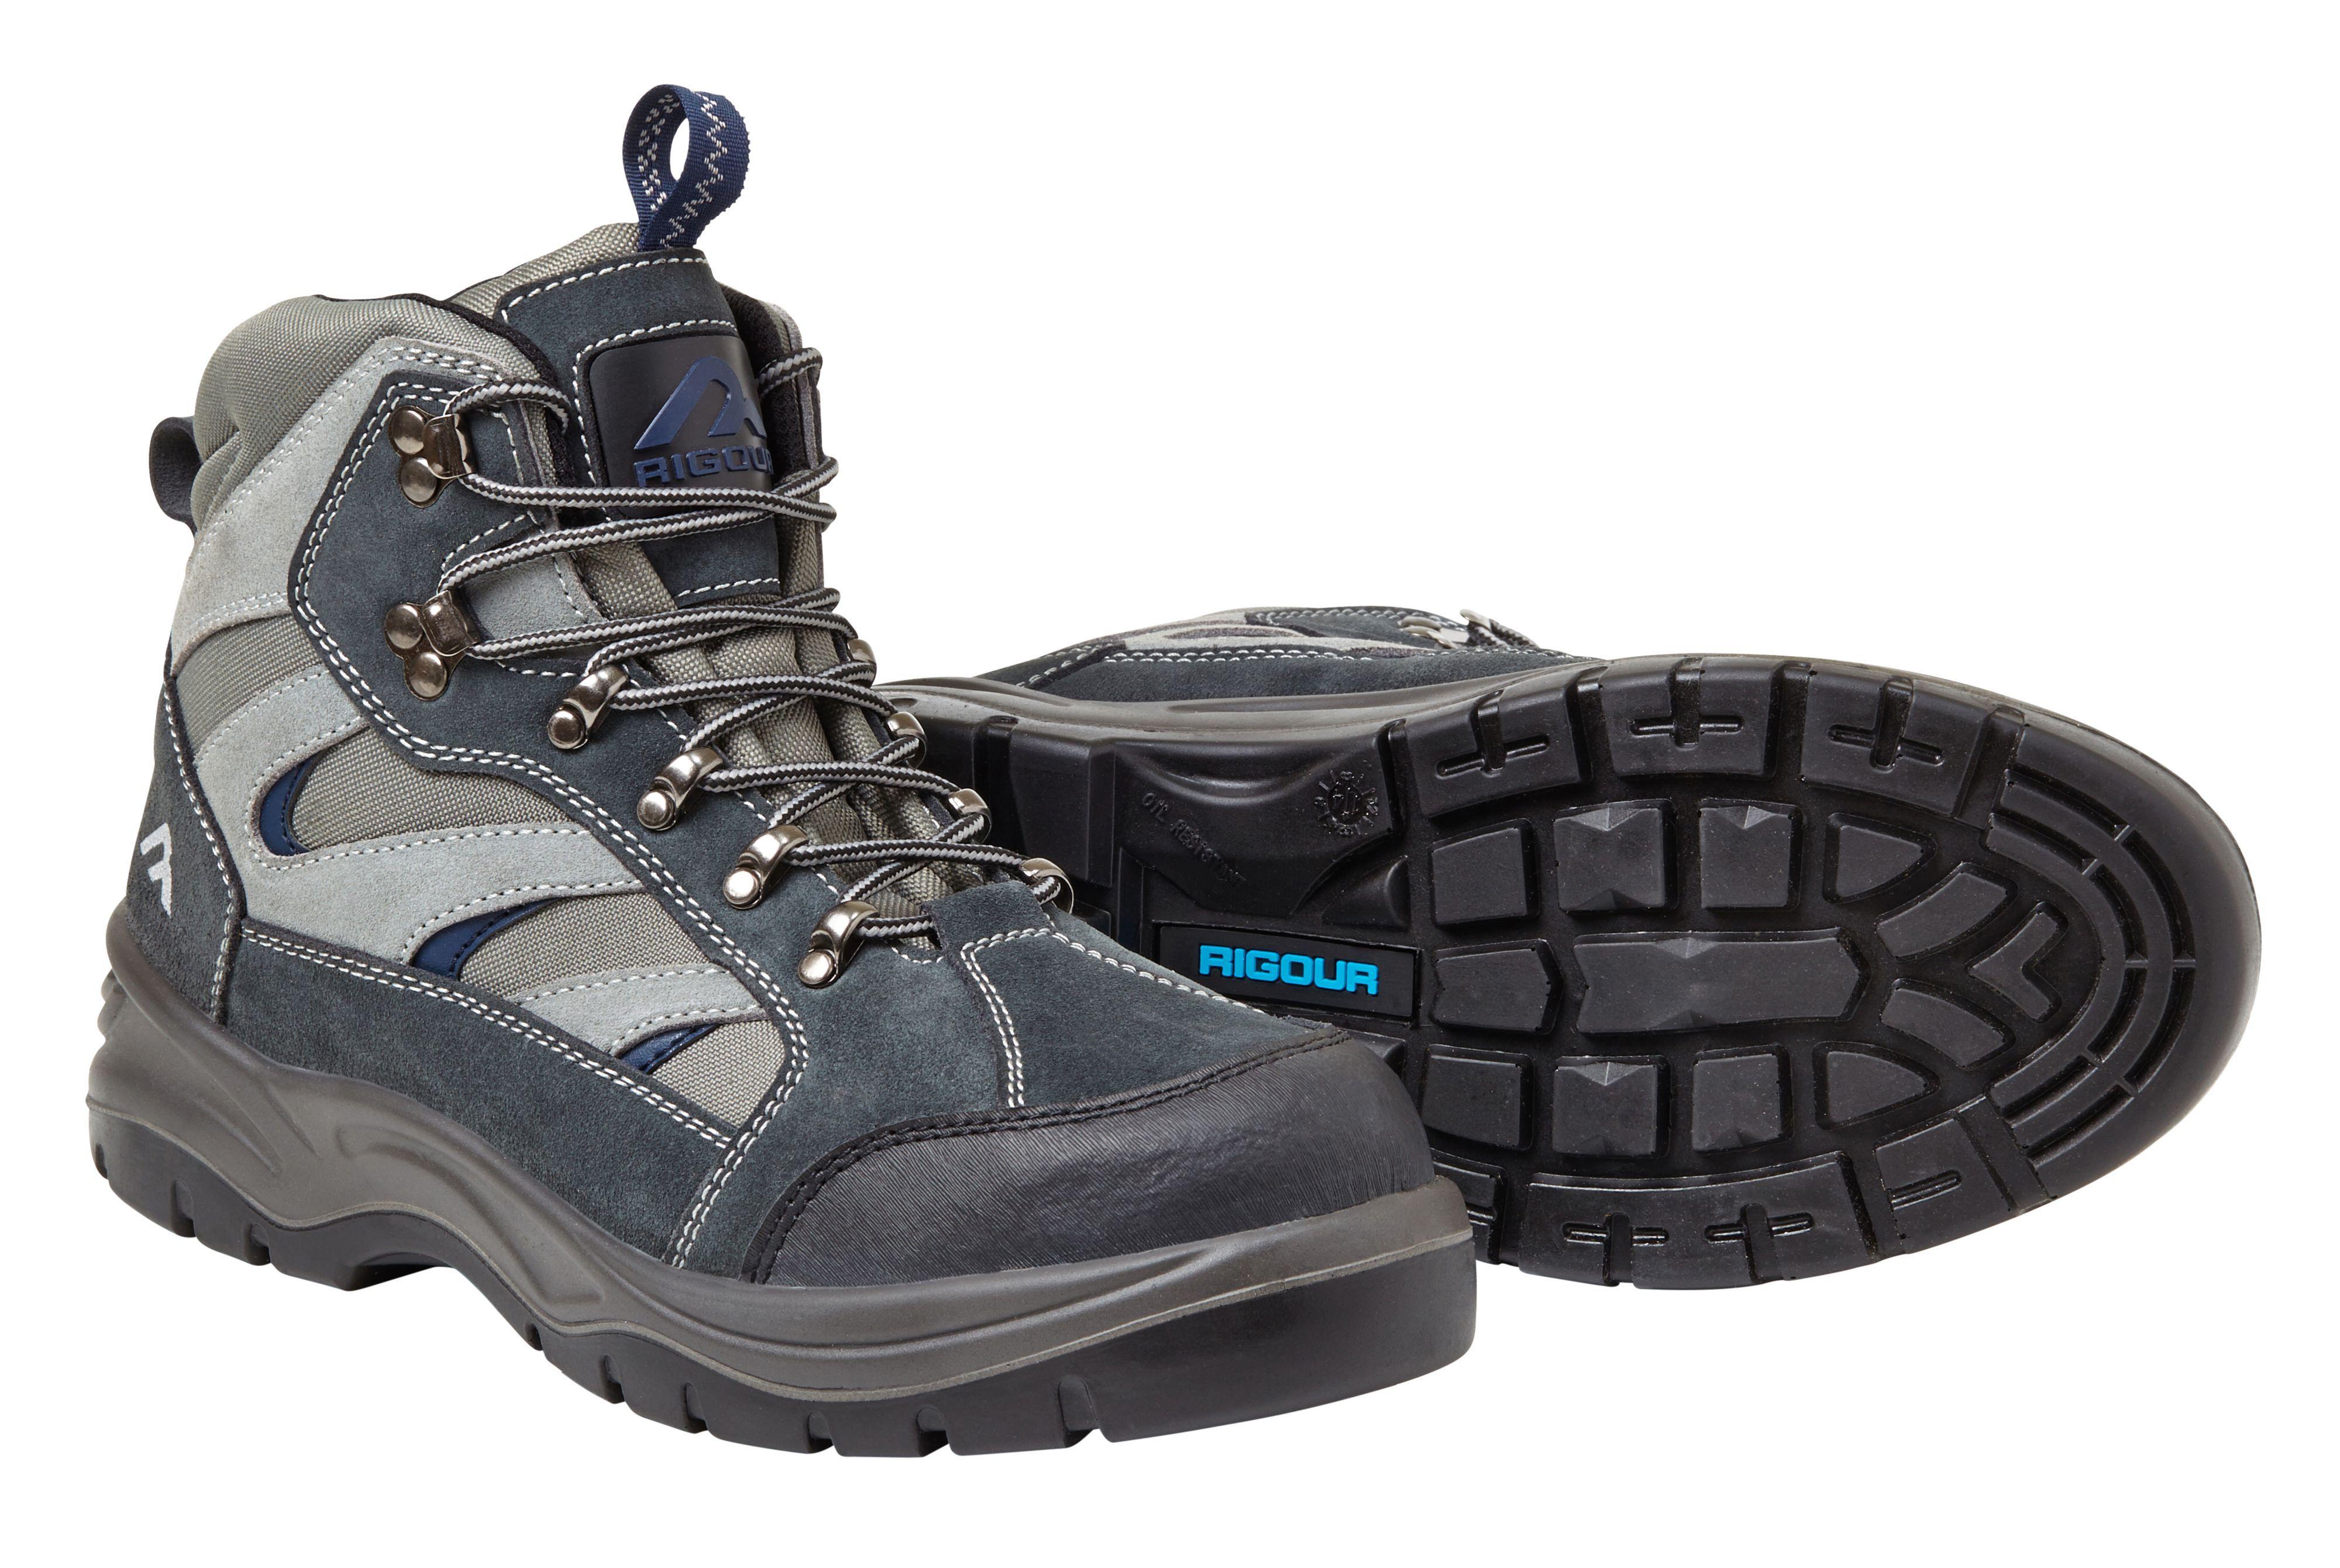 Rigour Grey & Blue Hiker Boots, Size 8